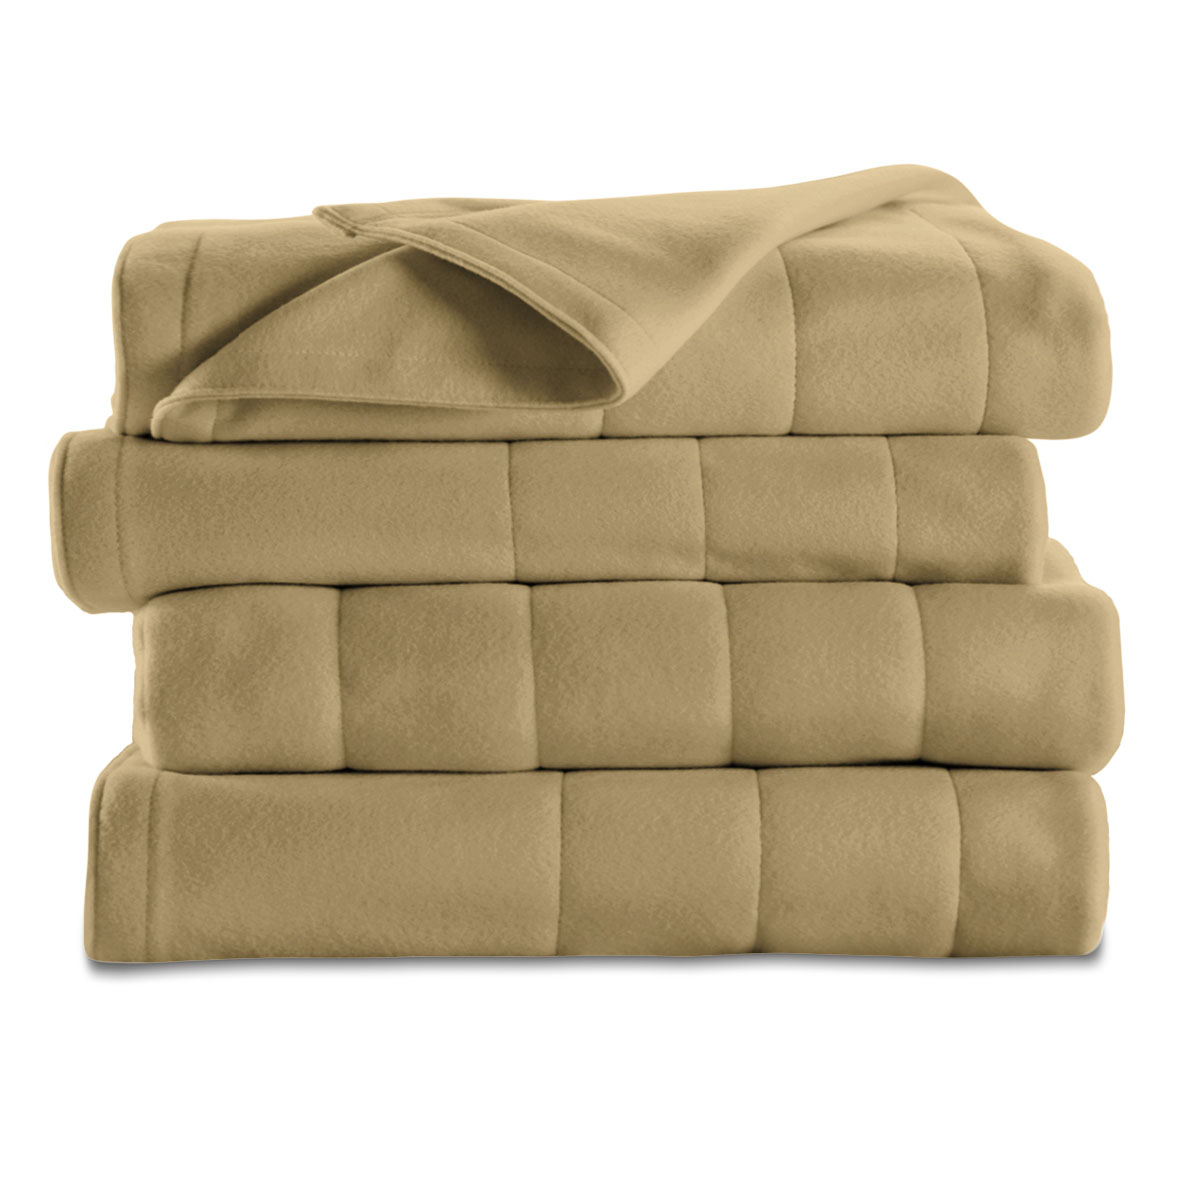 Sunbeamr King Quilted Fleece Heated Blanket, Acorn BRF9HKS-R727-13A44